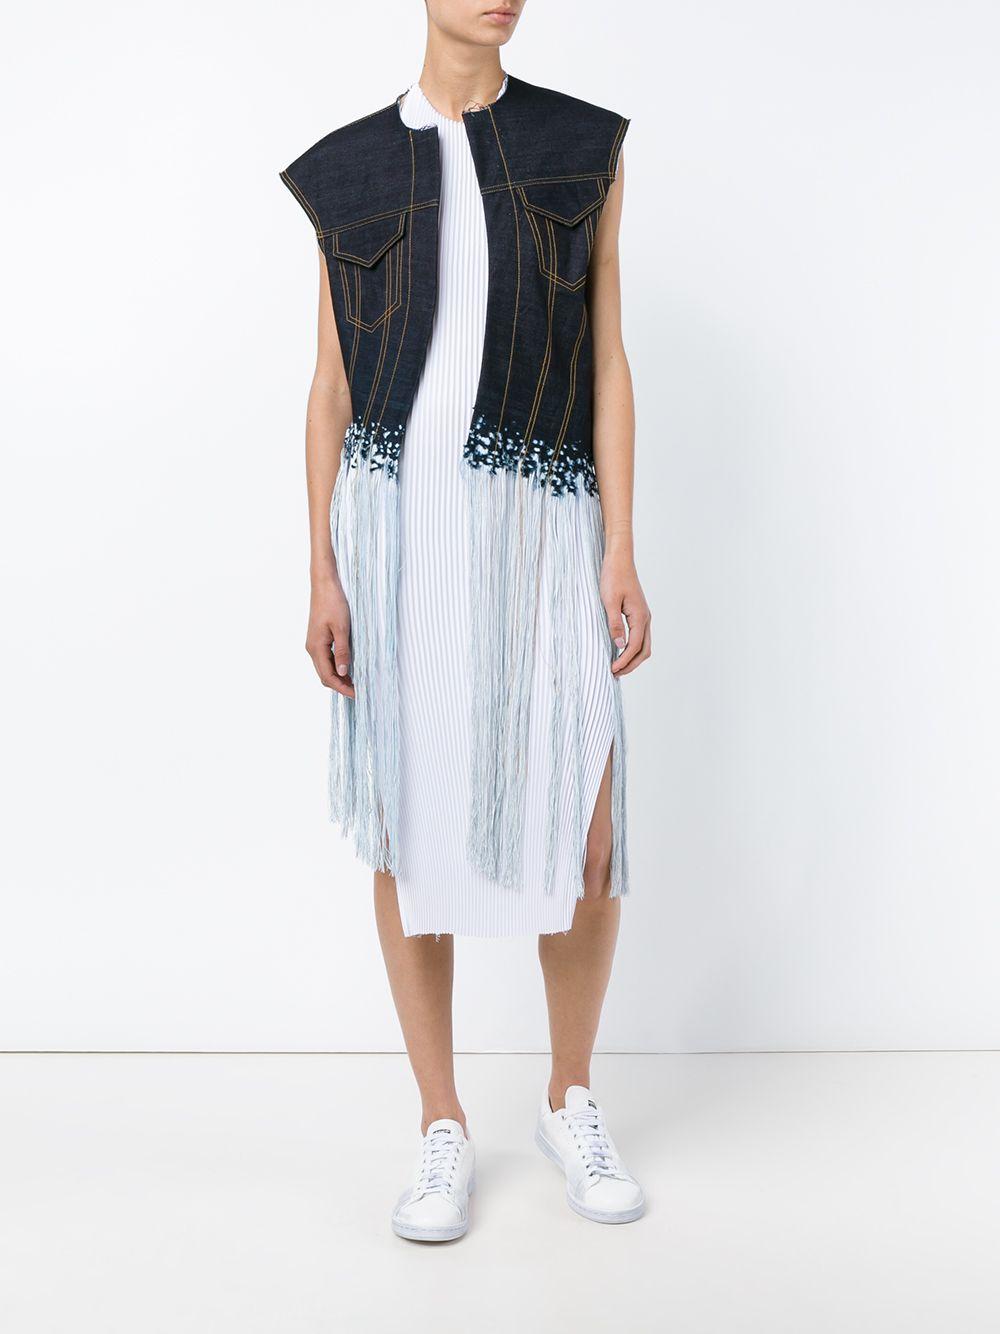 FAUSTINE STEINMETZ | Sleeveless Warp Float Denim Jacket | Womenswear | Browns Fashion